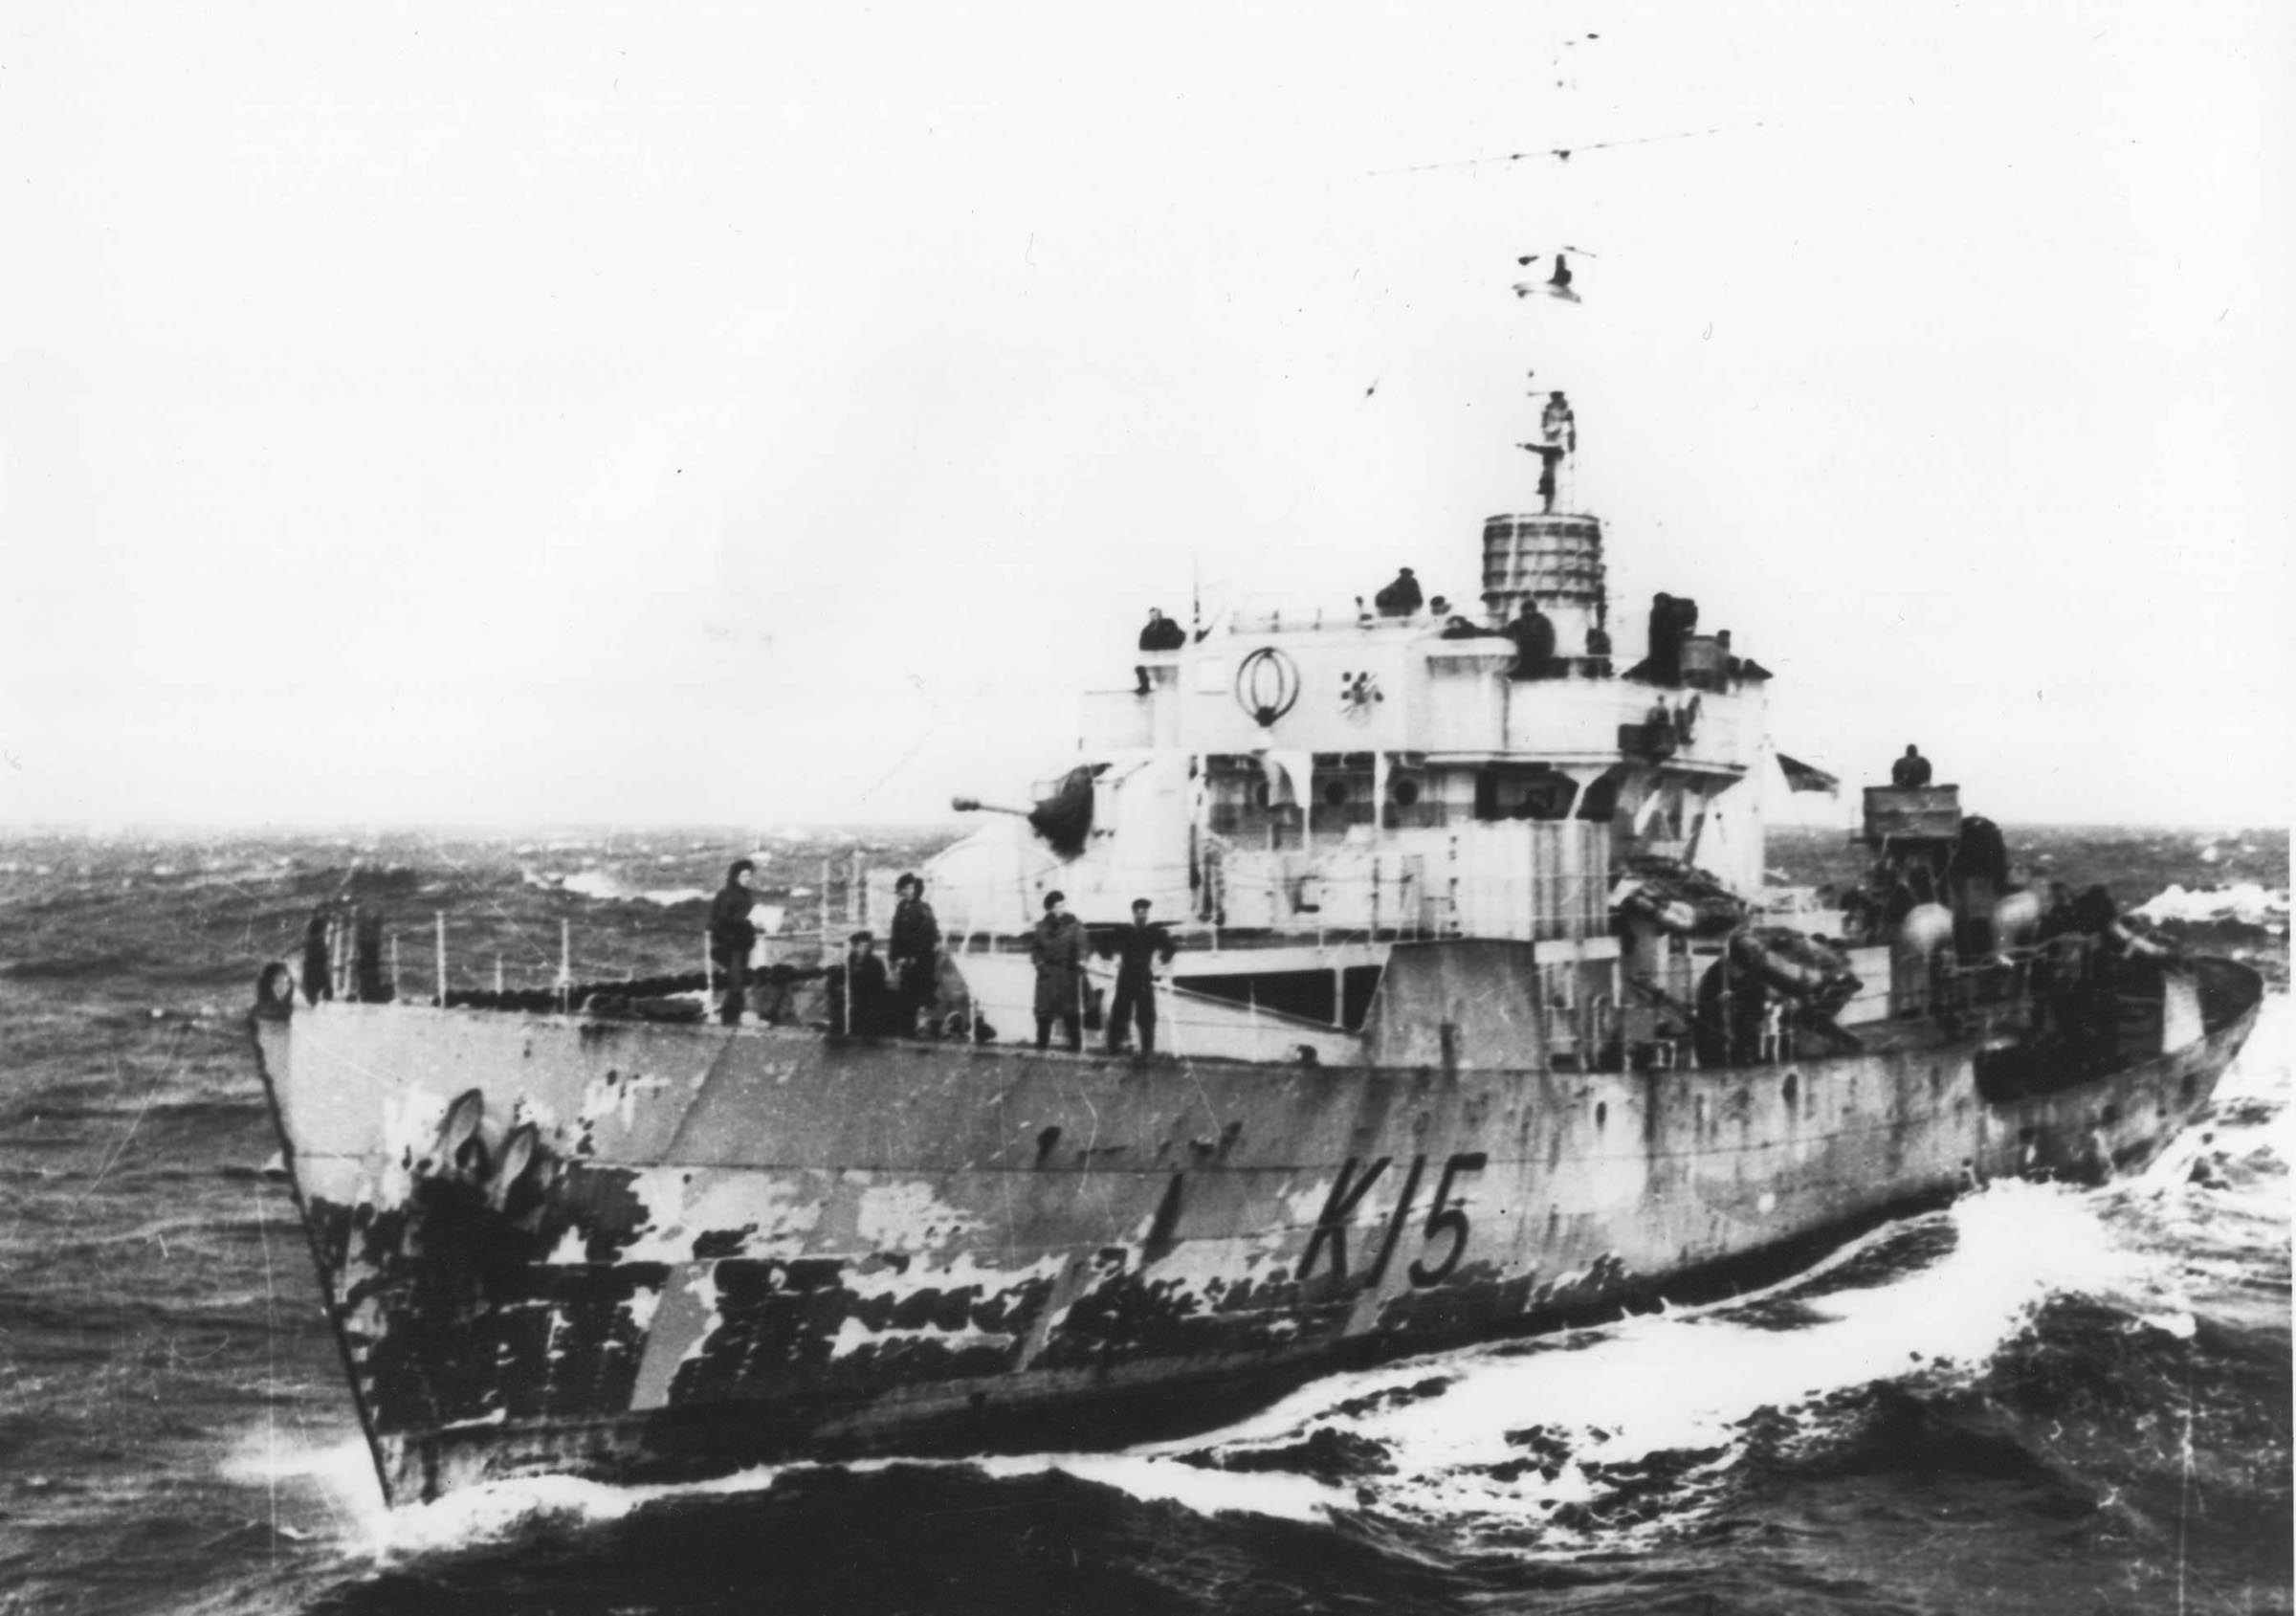 HMCS ATHOLL